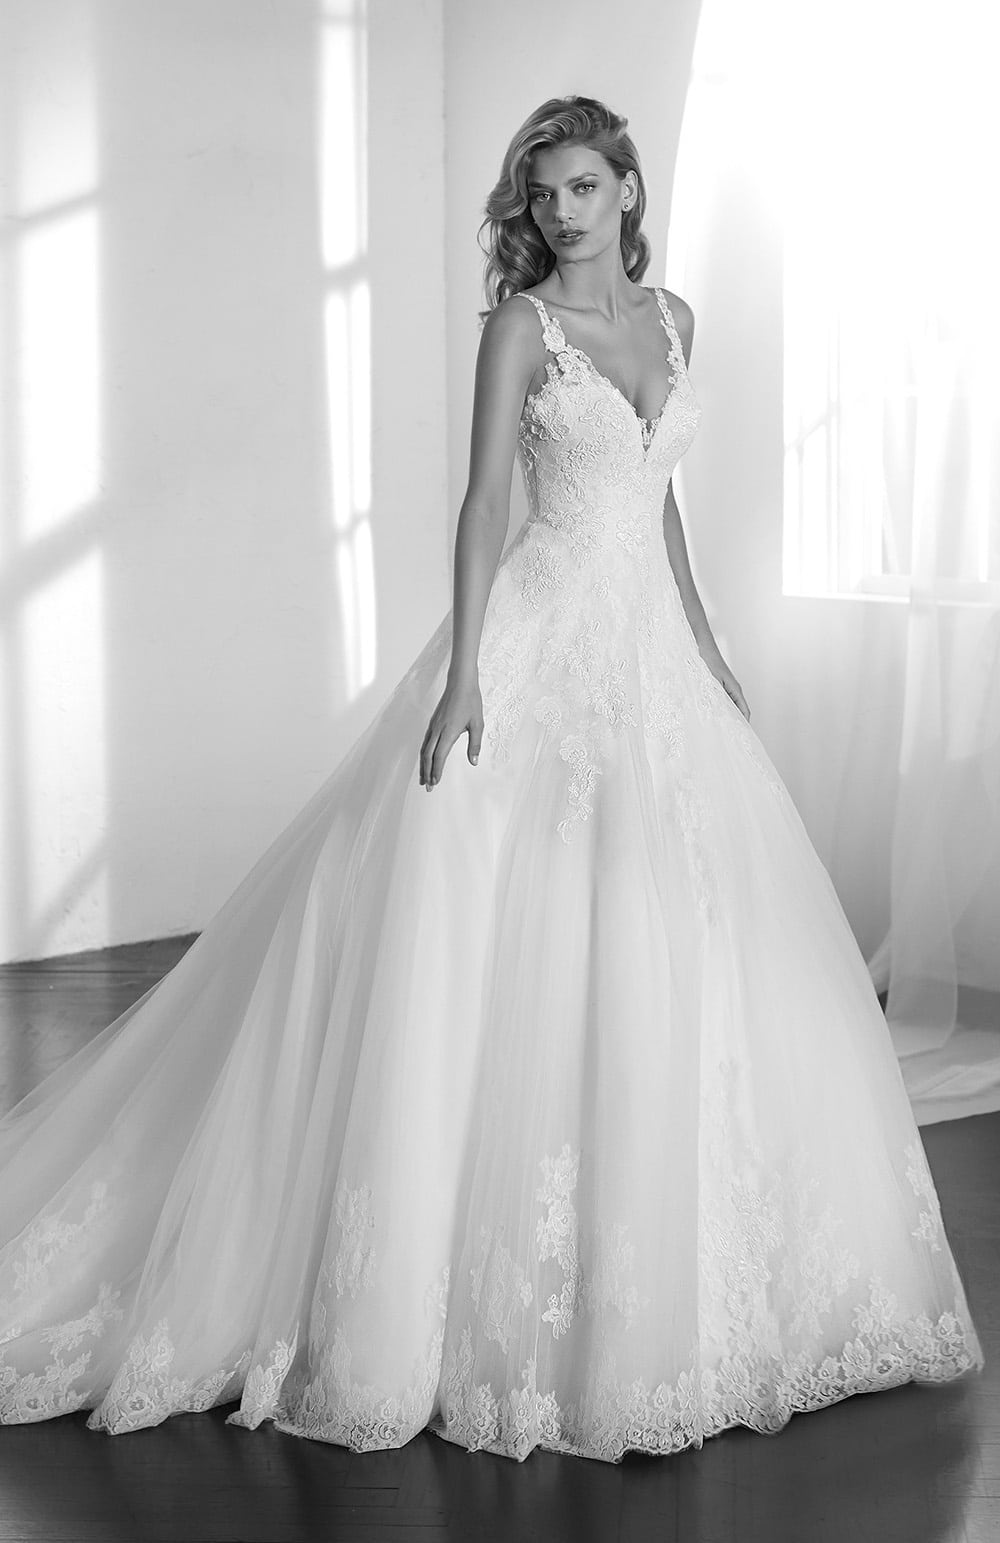 Robe de mariée Modèle Zingara